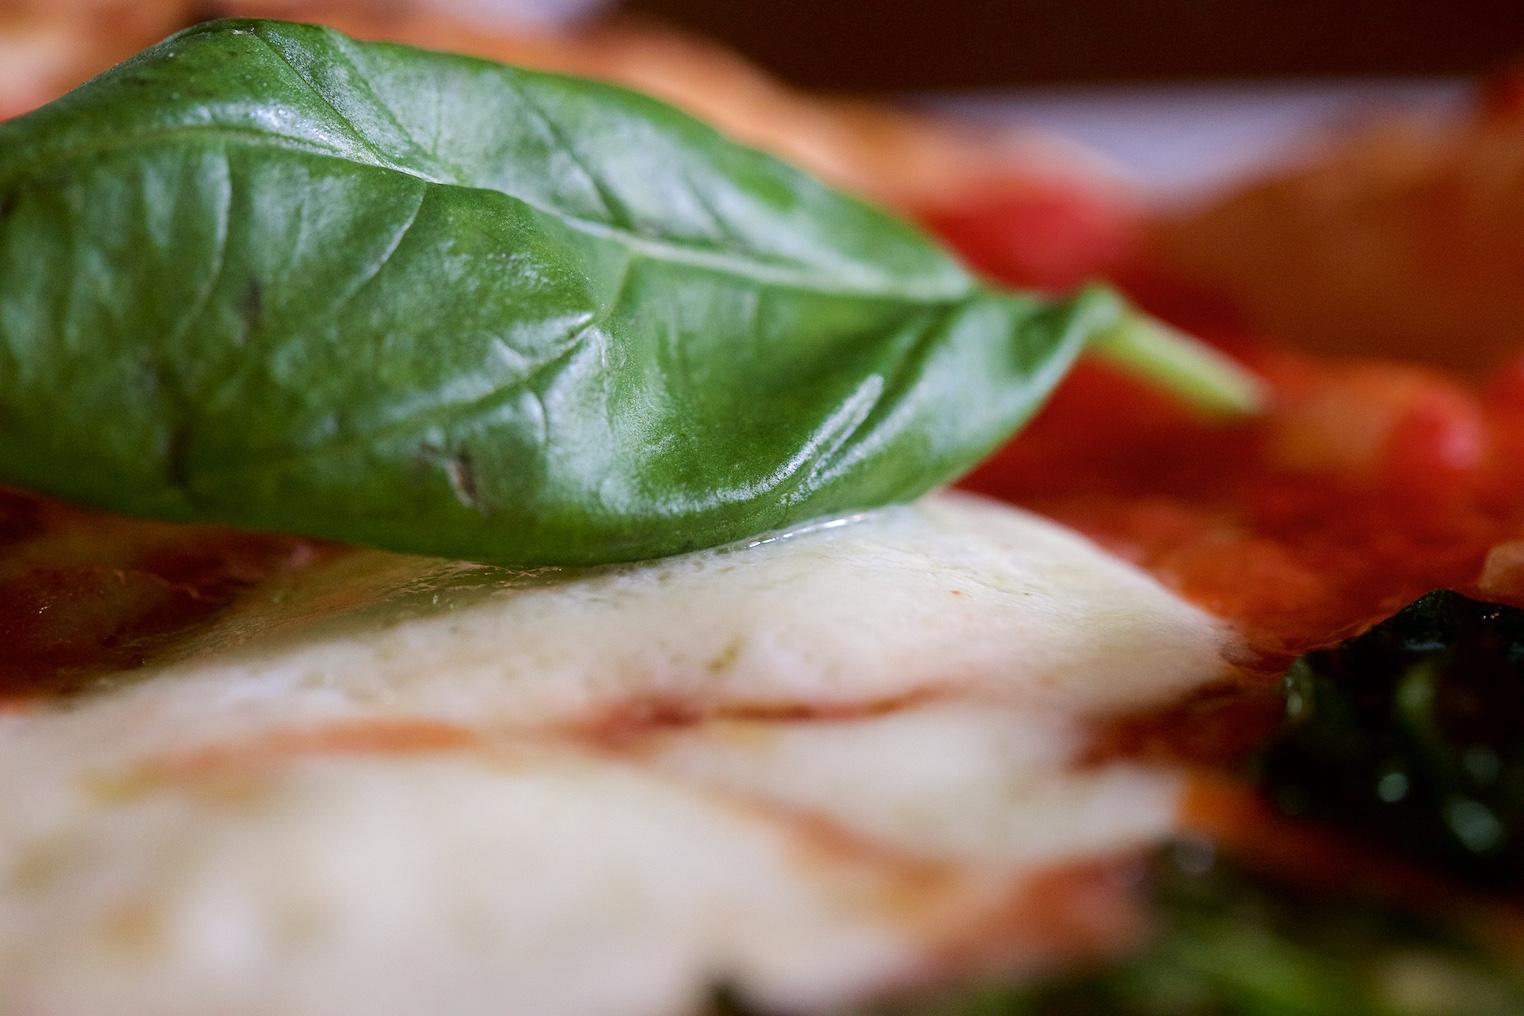 148-Pizzazzà-Nologo_IMG_1589